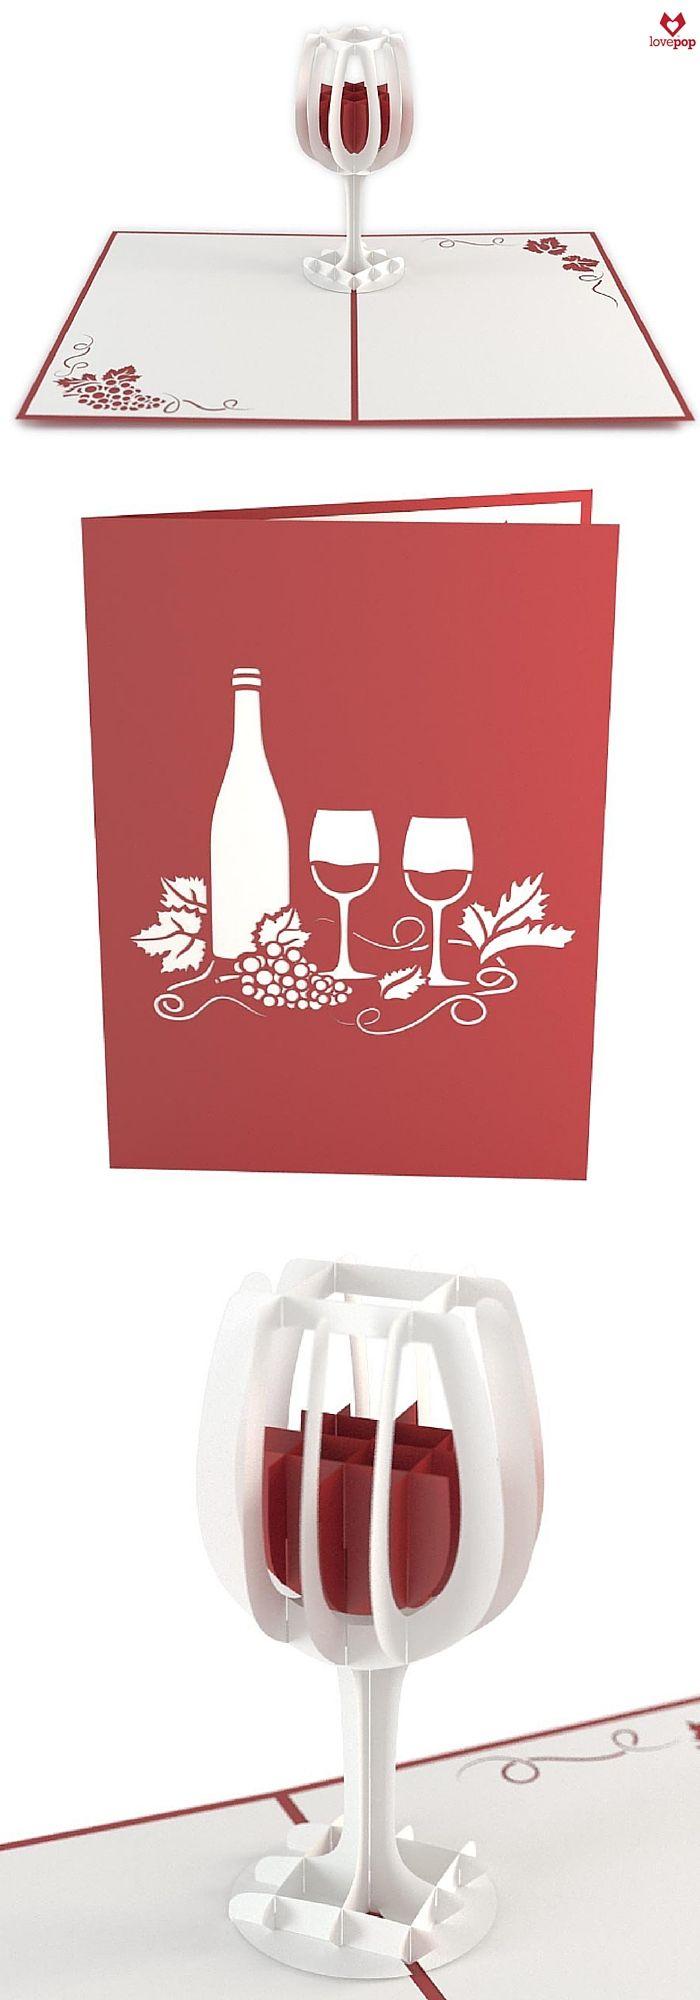 Wine Glass Pop Up Card Templates Pop Up Cards Paper Flower Centerpieces